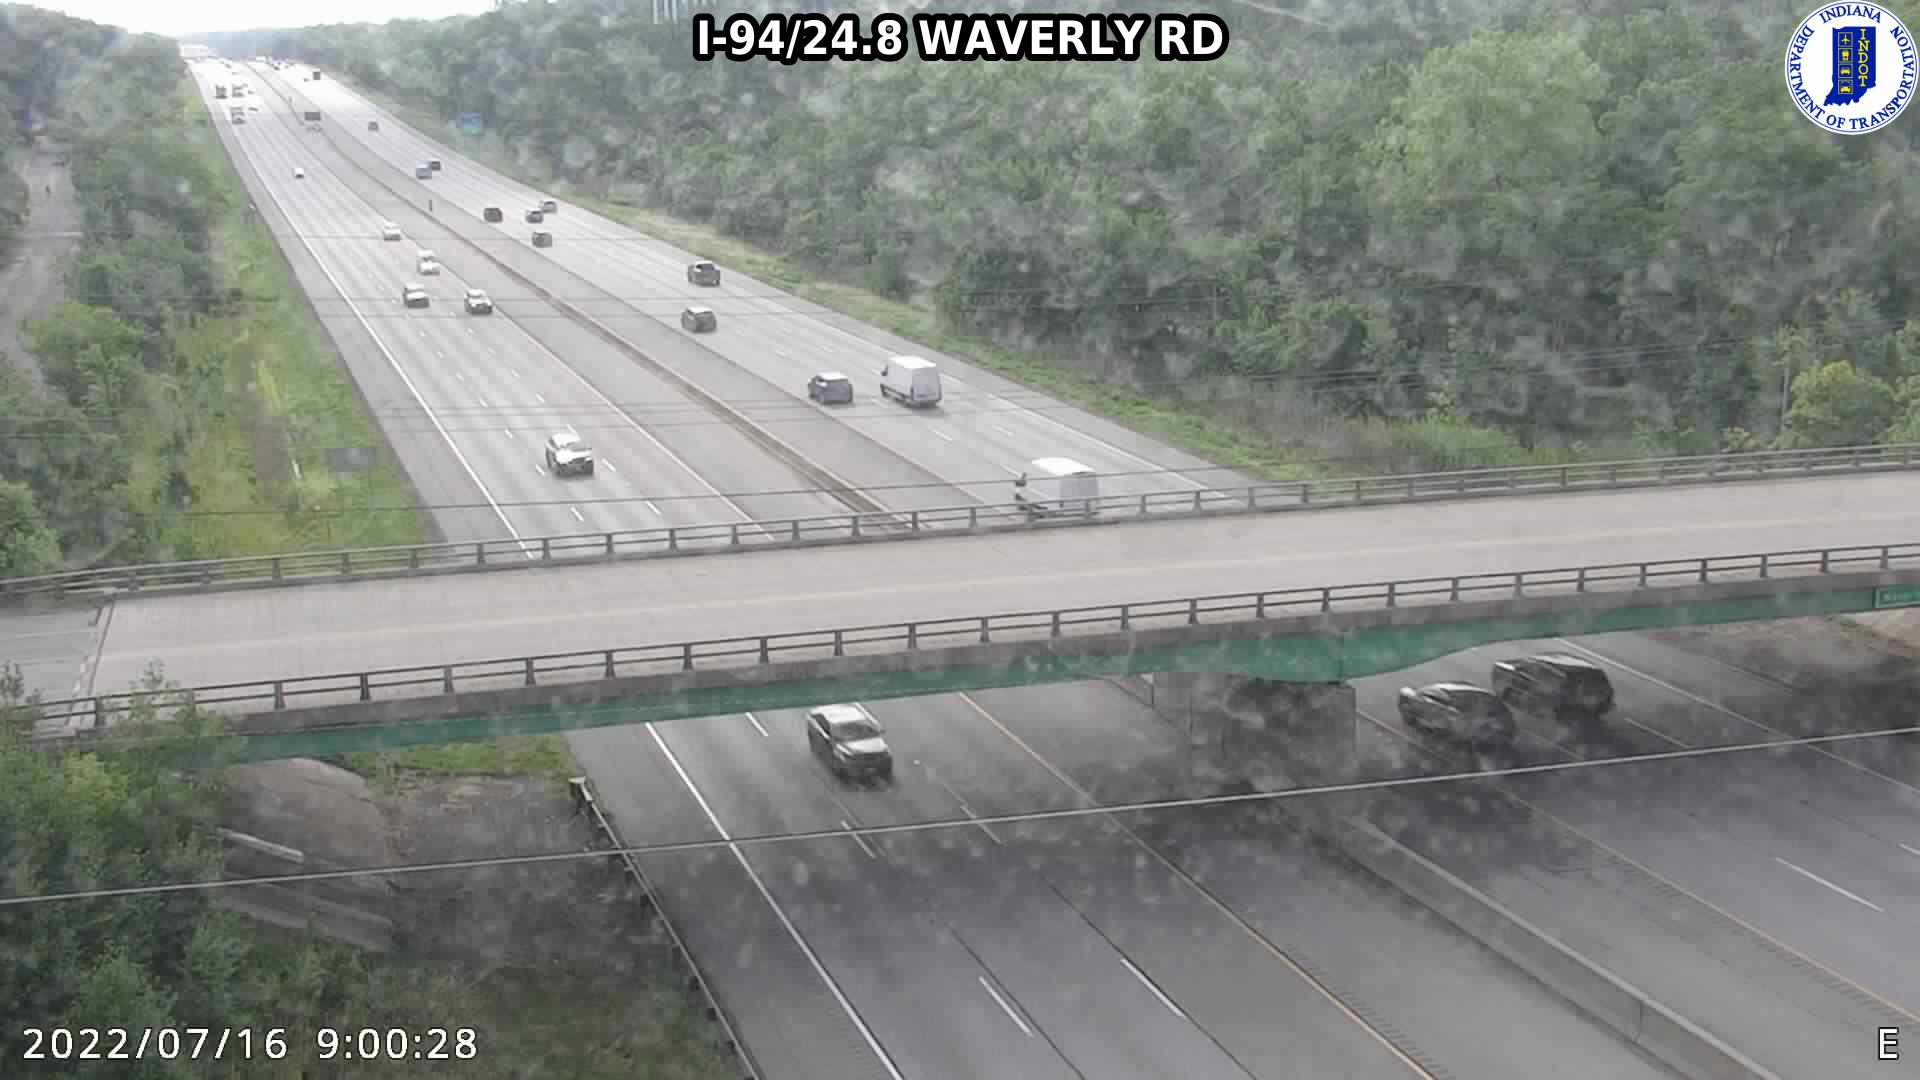 camera snapshot for WB I-94 at Waverly Rd (-0.1 miles)